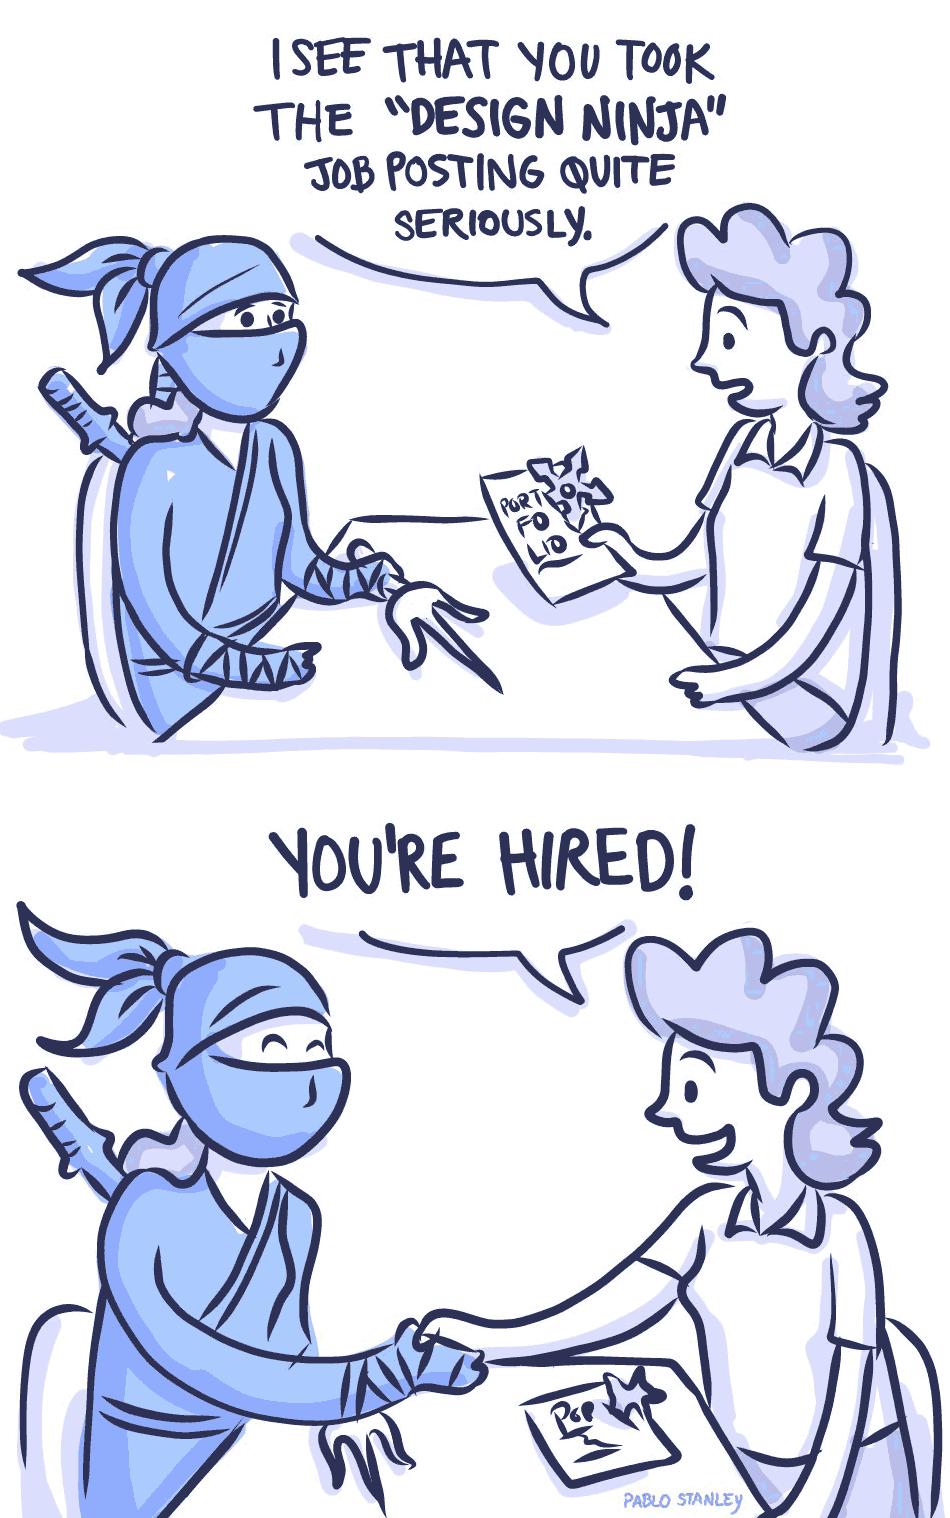 Pablo Stanley comic about a Design Ninja